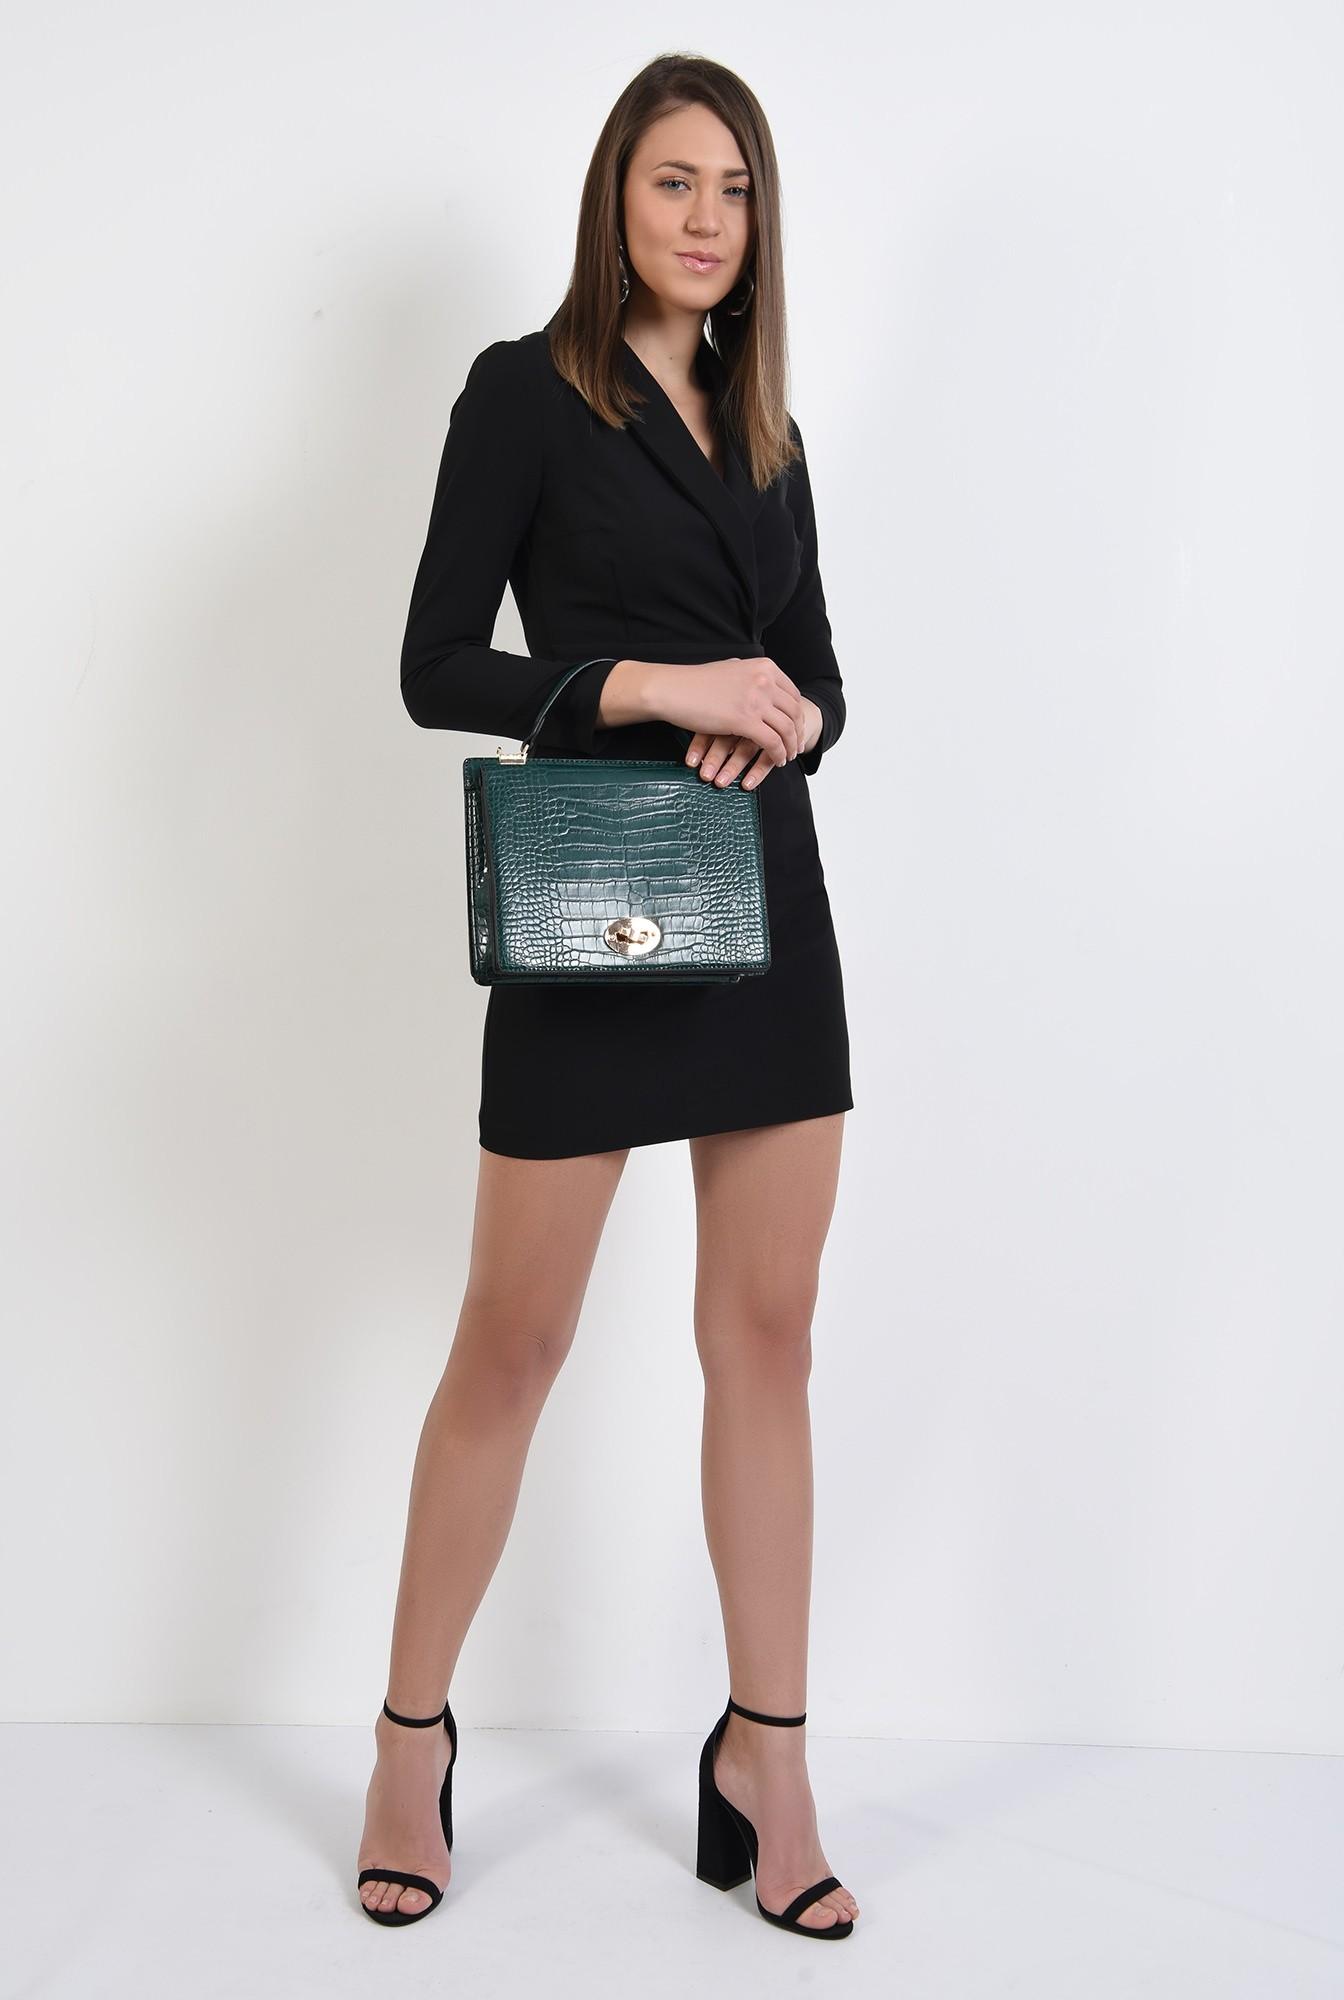 3 - rochie mini, neagra, cu revere, scurta, maneci ajustate, Poema